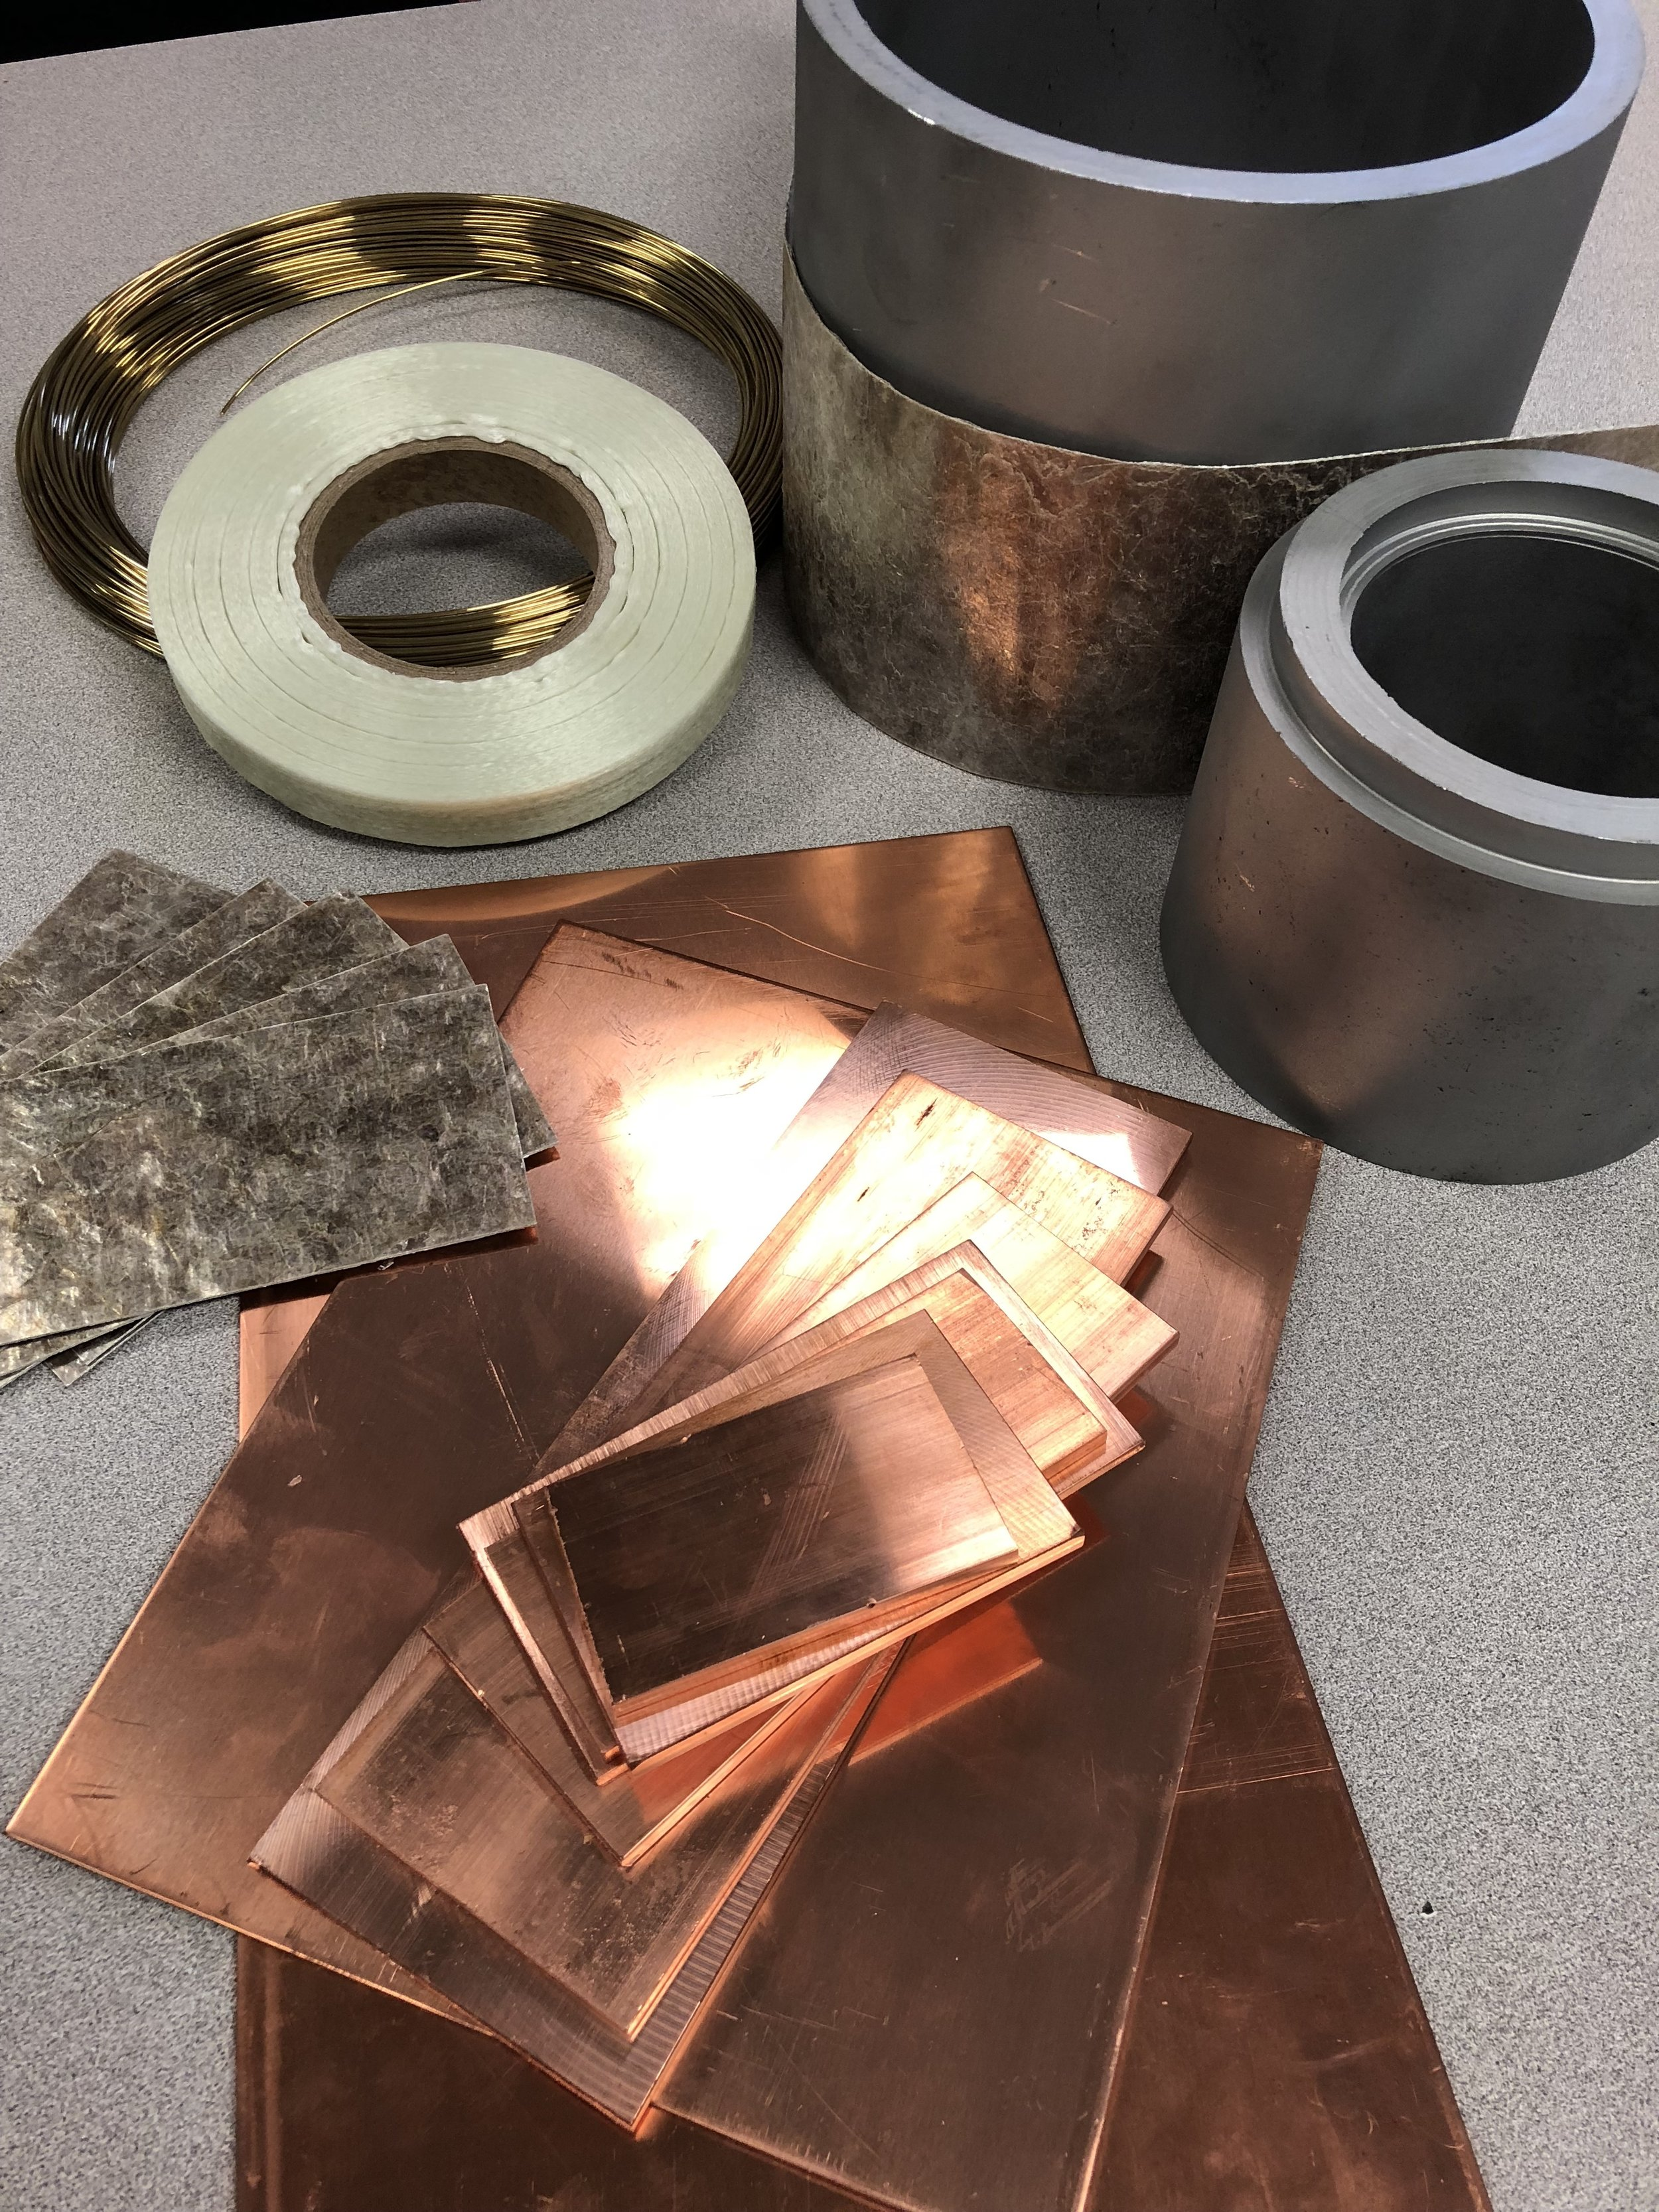 Commutator materials copper steel mica res-i-glass tape